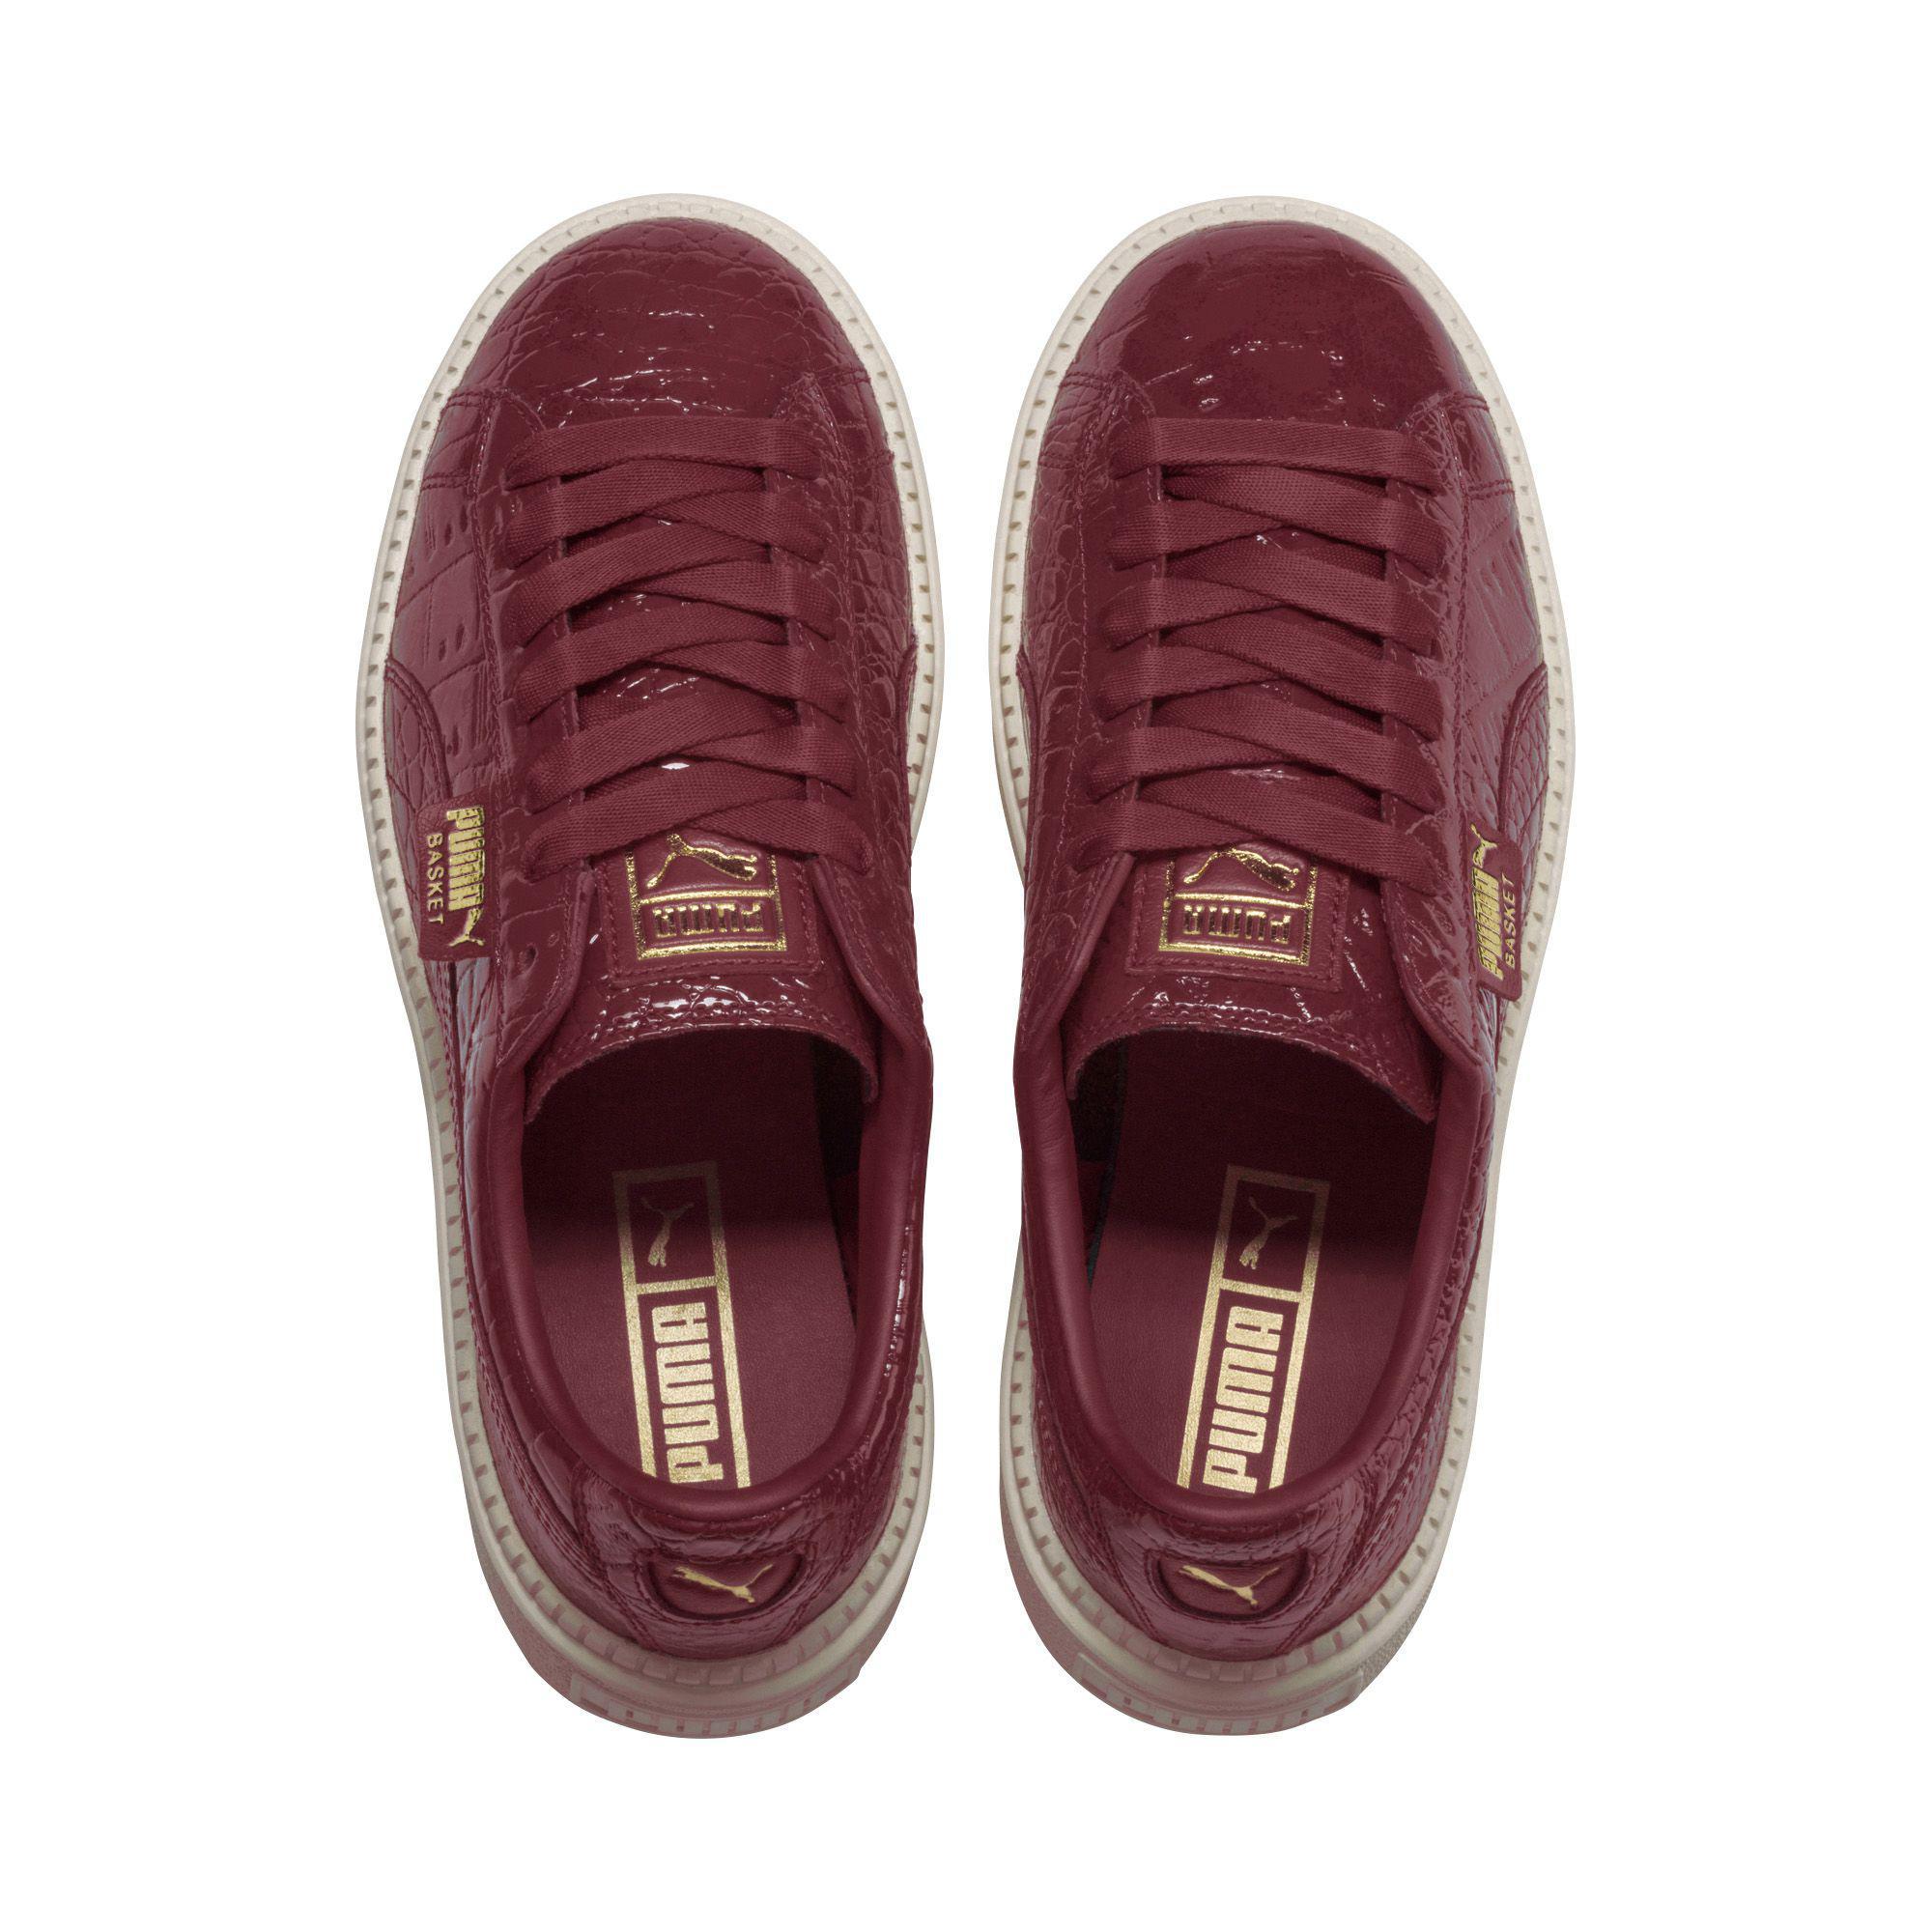 66a583cf8c0 Platform Trace Lux Sneakers Lyst Women s Exotic Puma HWxR50n4p